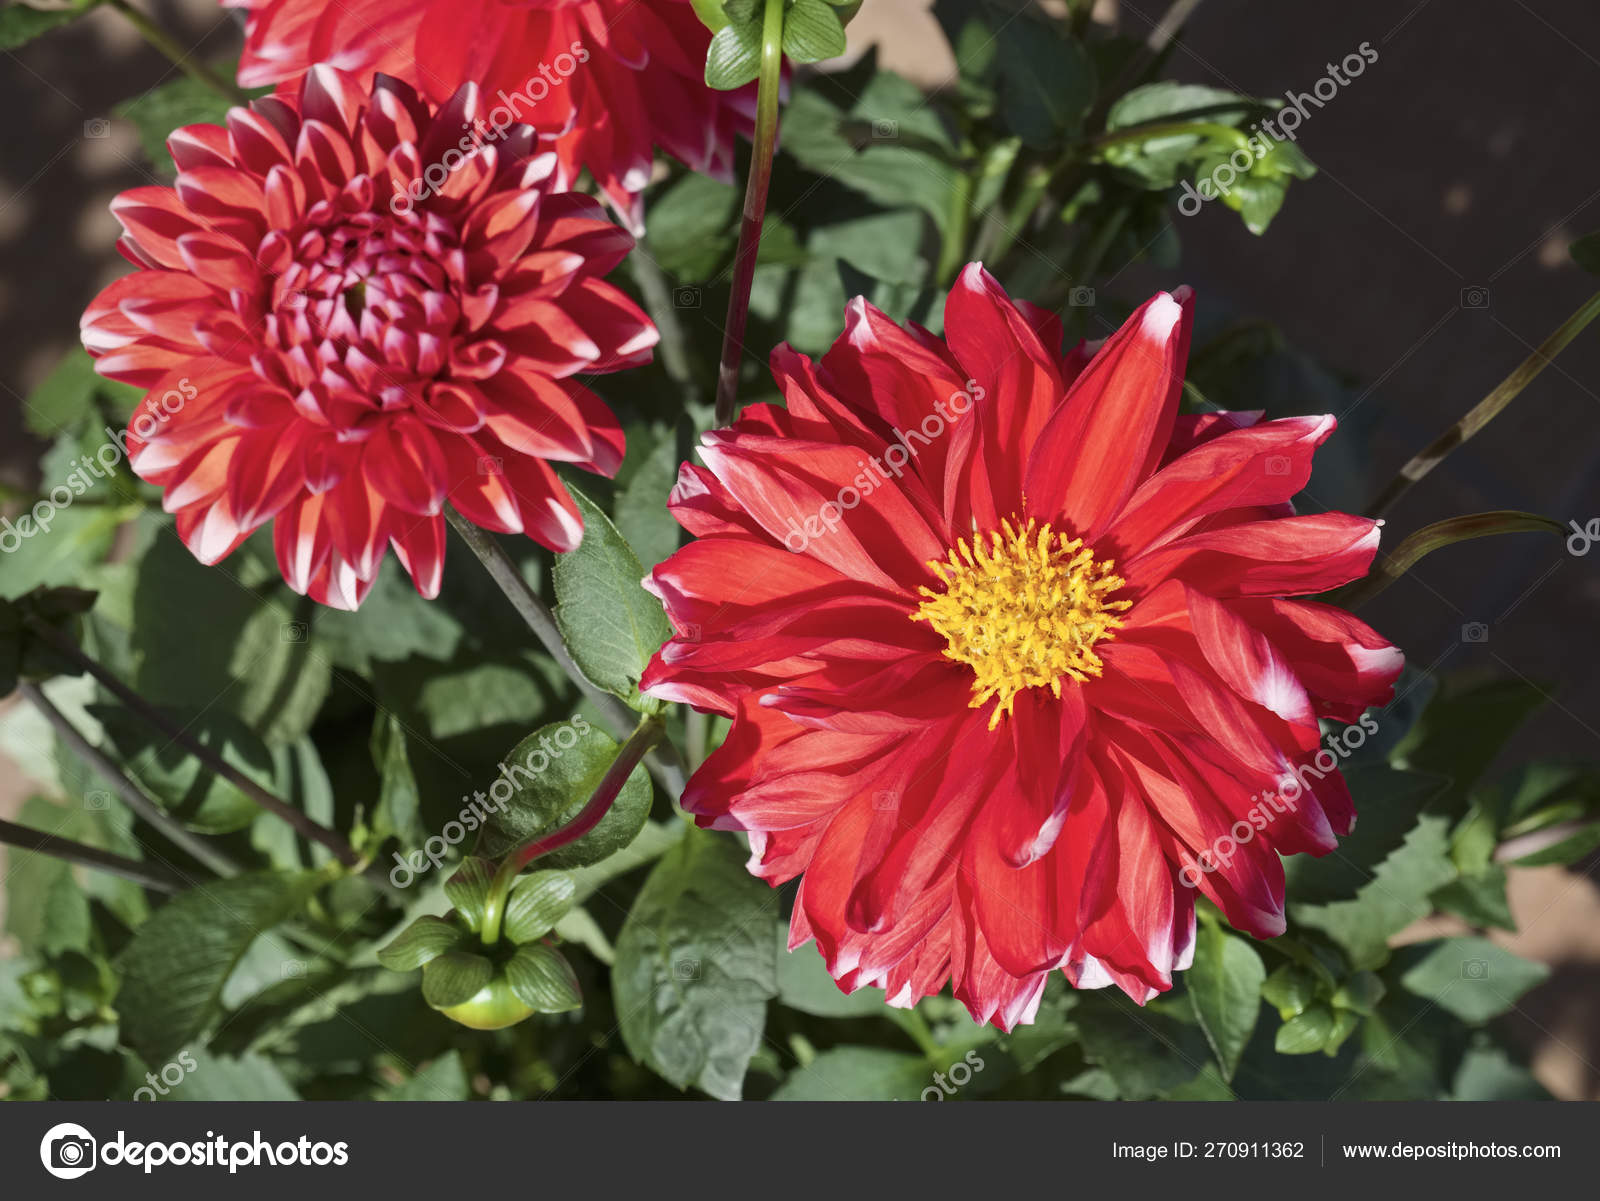 Flores Dalia Vermelhas Jardim Stock Photo C Agiampiccolo 270911362